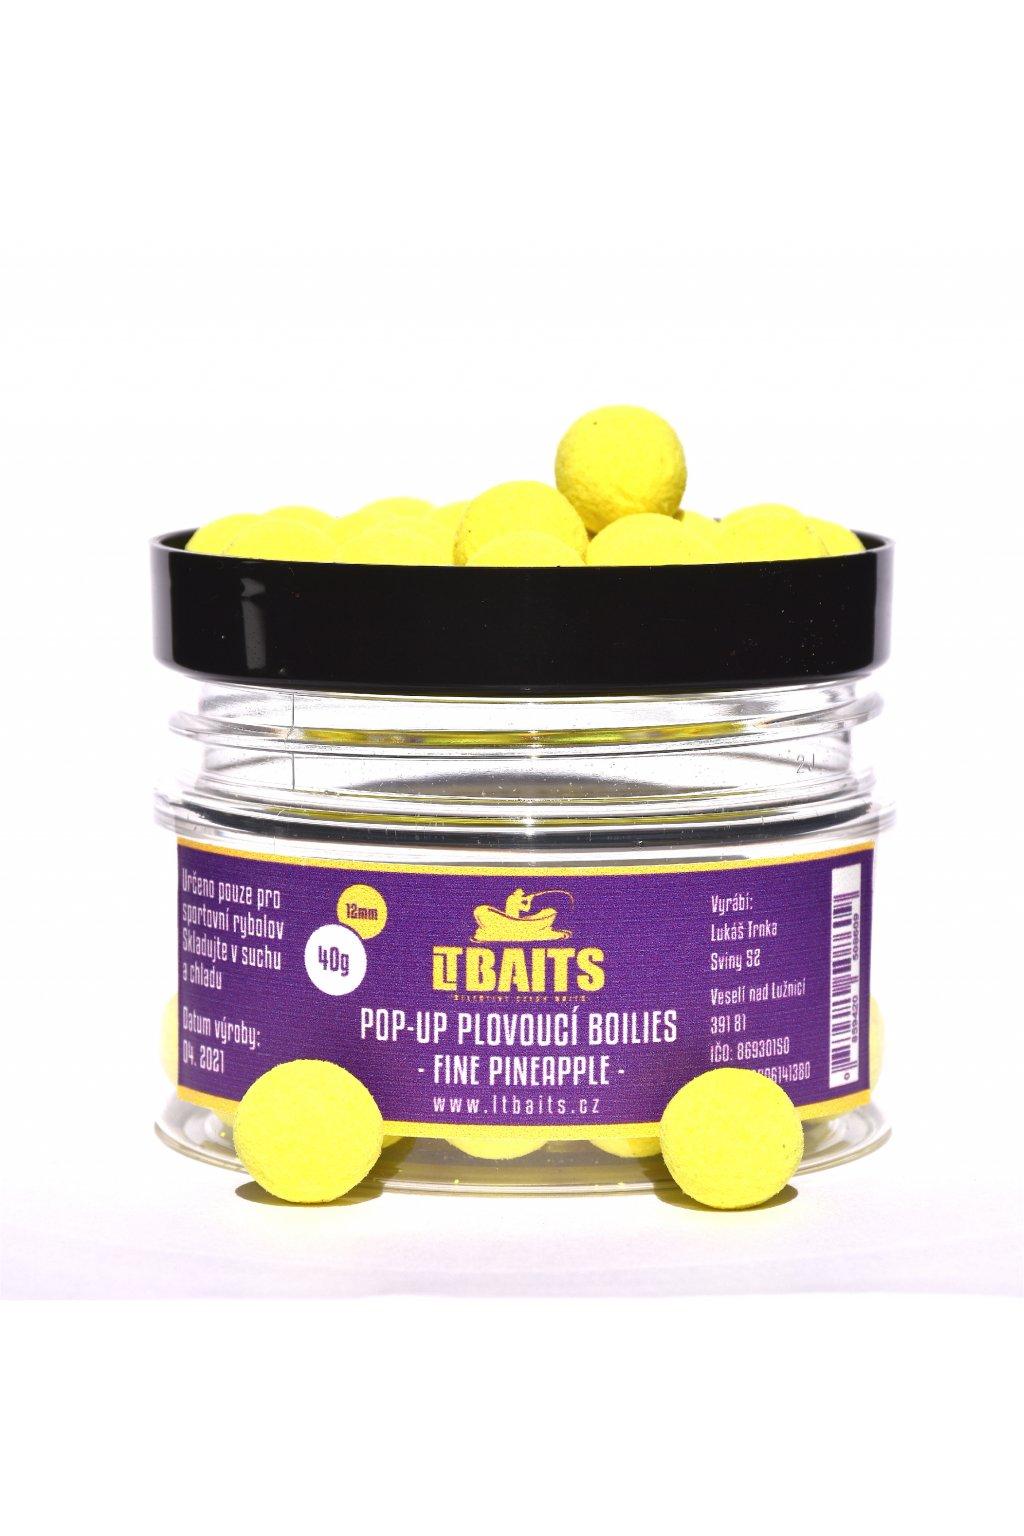 LT Bait Pop Up Boilies Fine Pineapple 40g